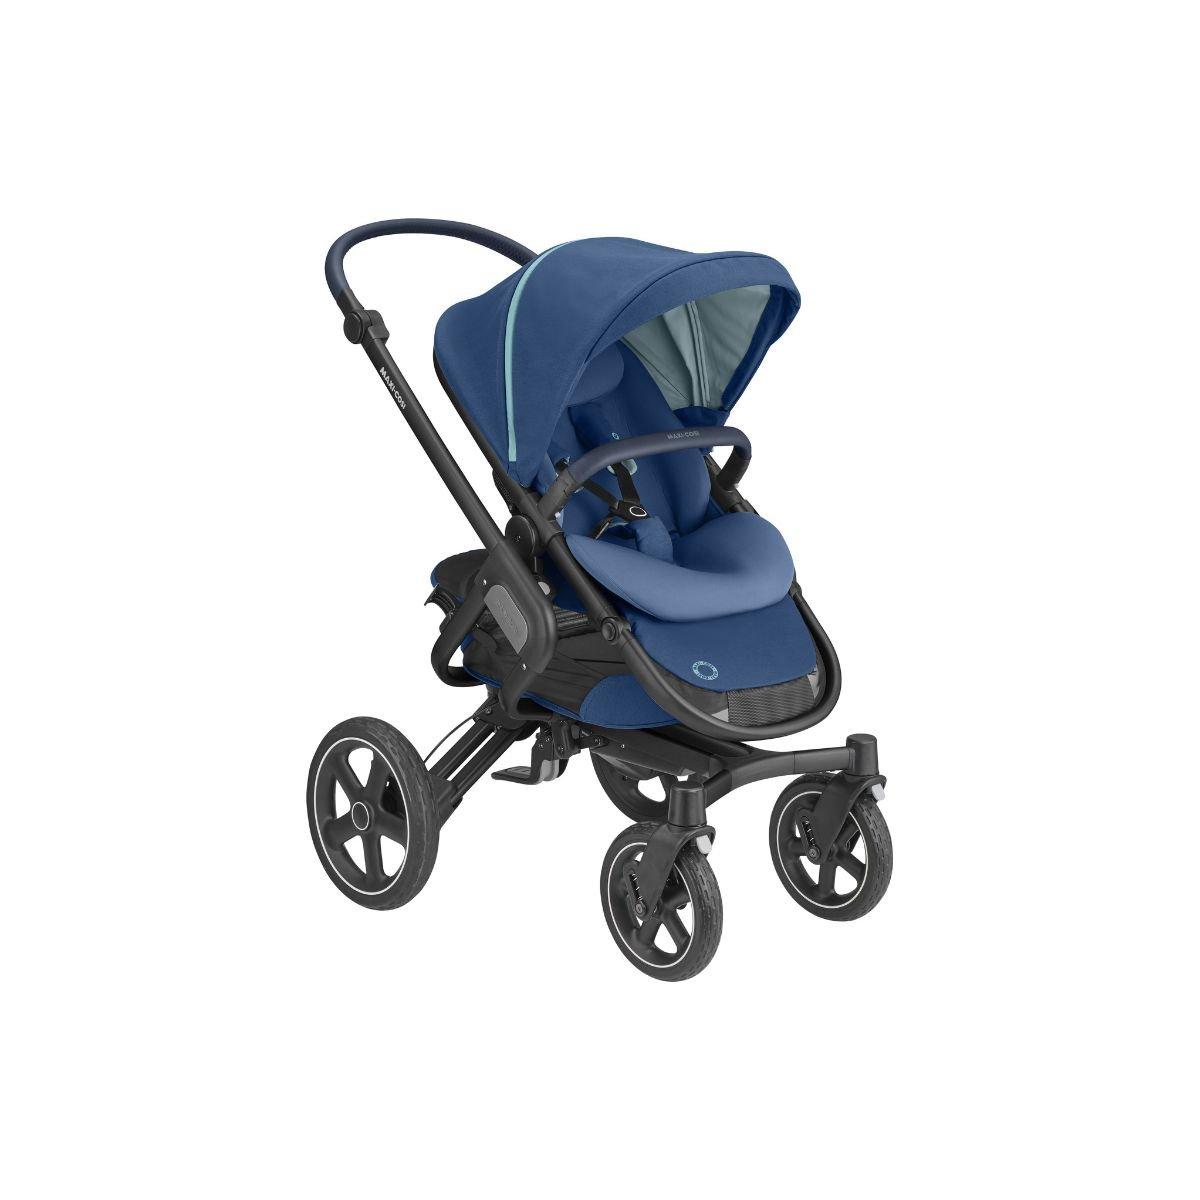 Carucior Sport Maxi-Cosi Nova 4 Essential, Blue